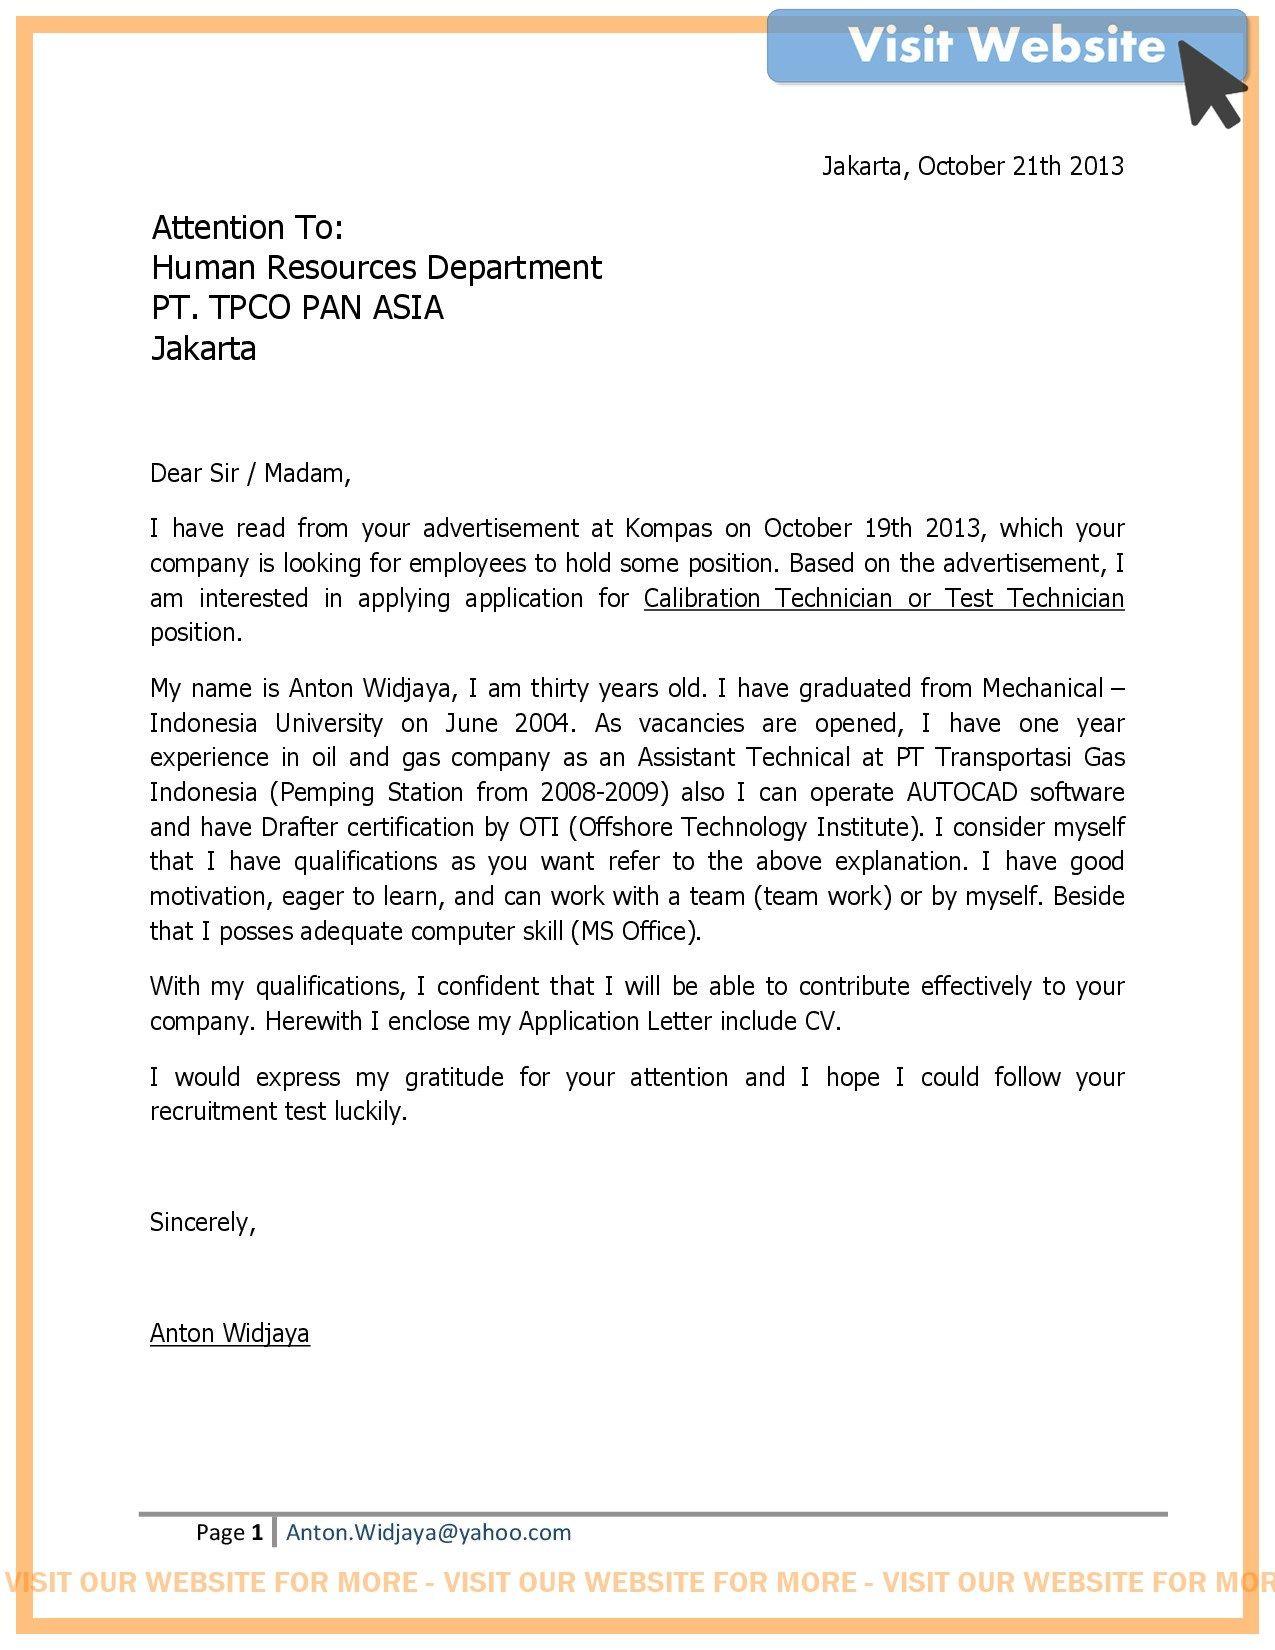 mit sloan mba cover letter sample in 2020 Job